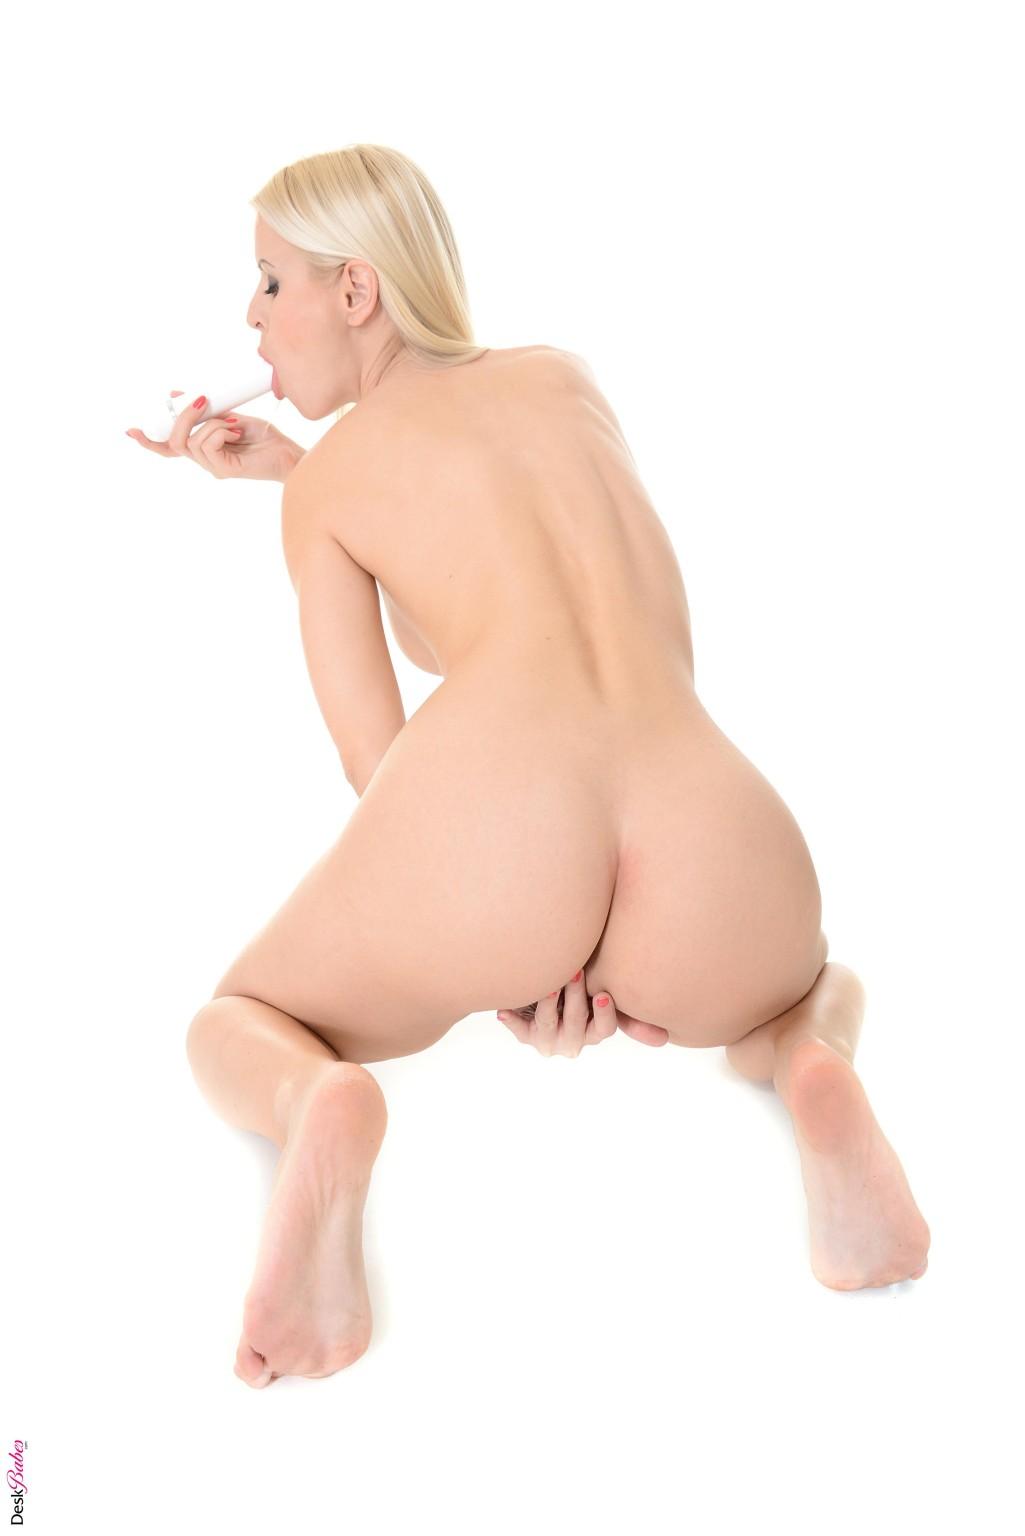 Ms Lynna, Lynna Nilsson - Секс игрушки - Галерея № 3466070